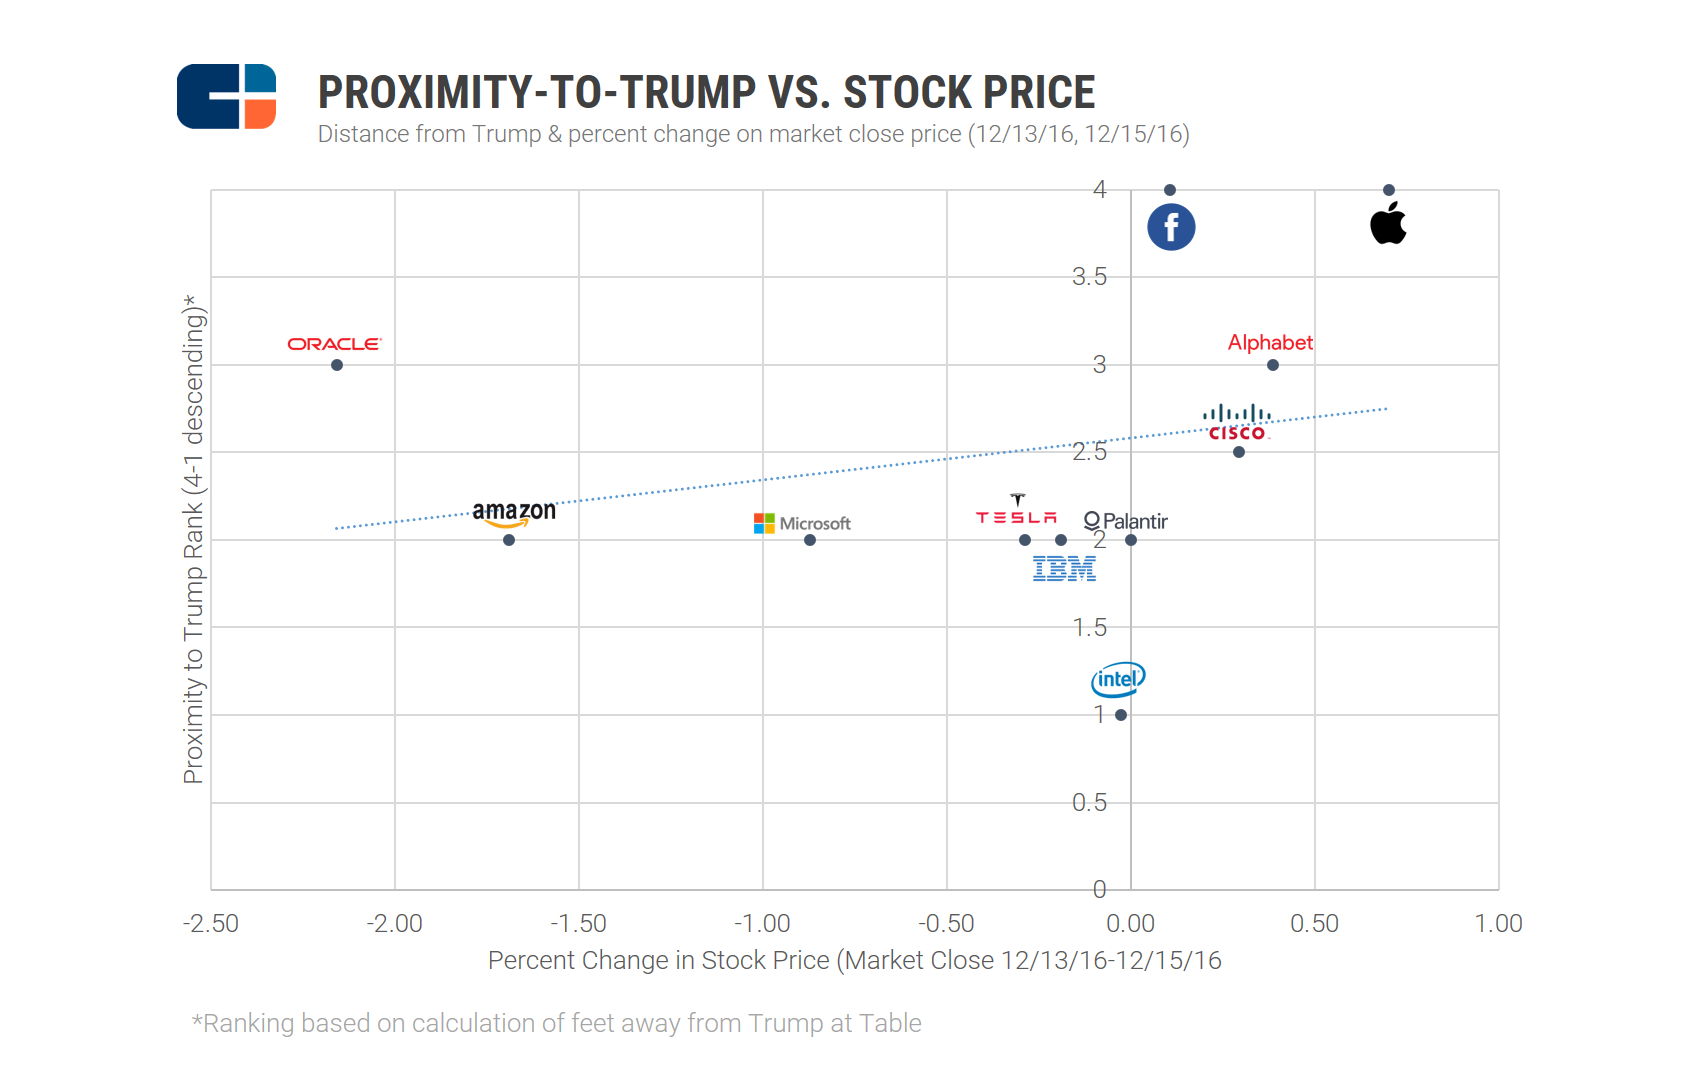 Trump Companies intheroom stockprice4